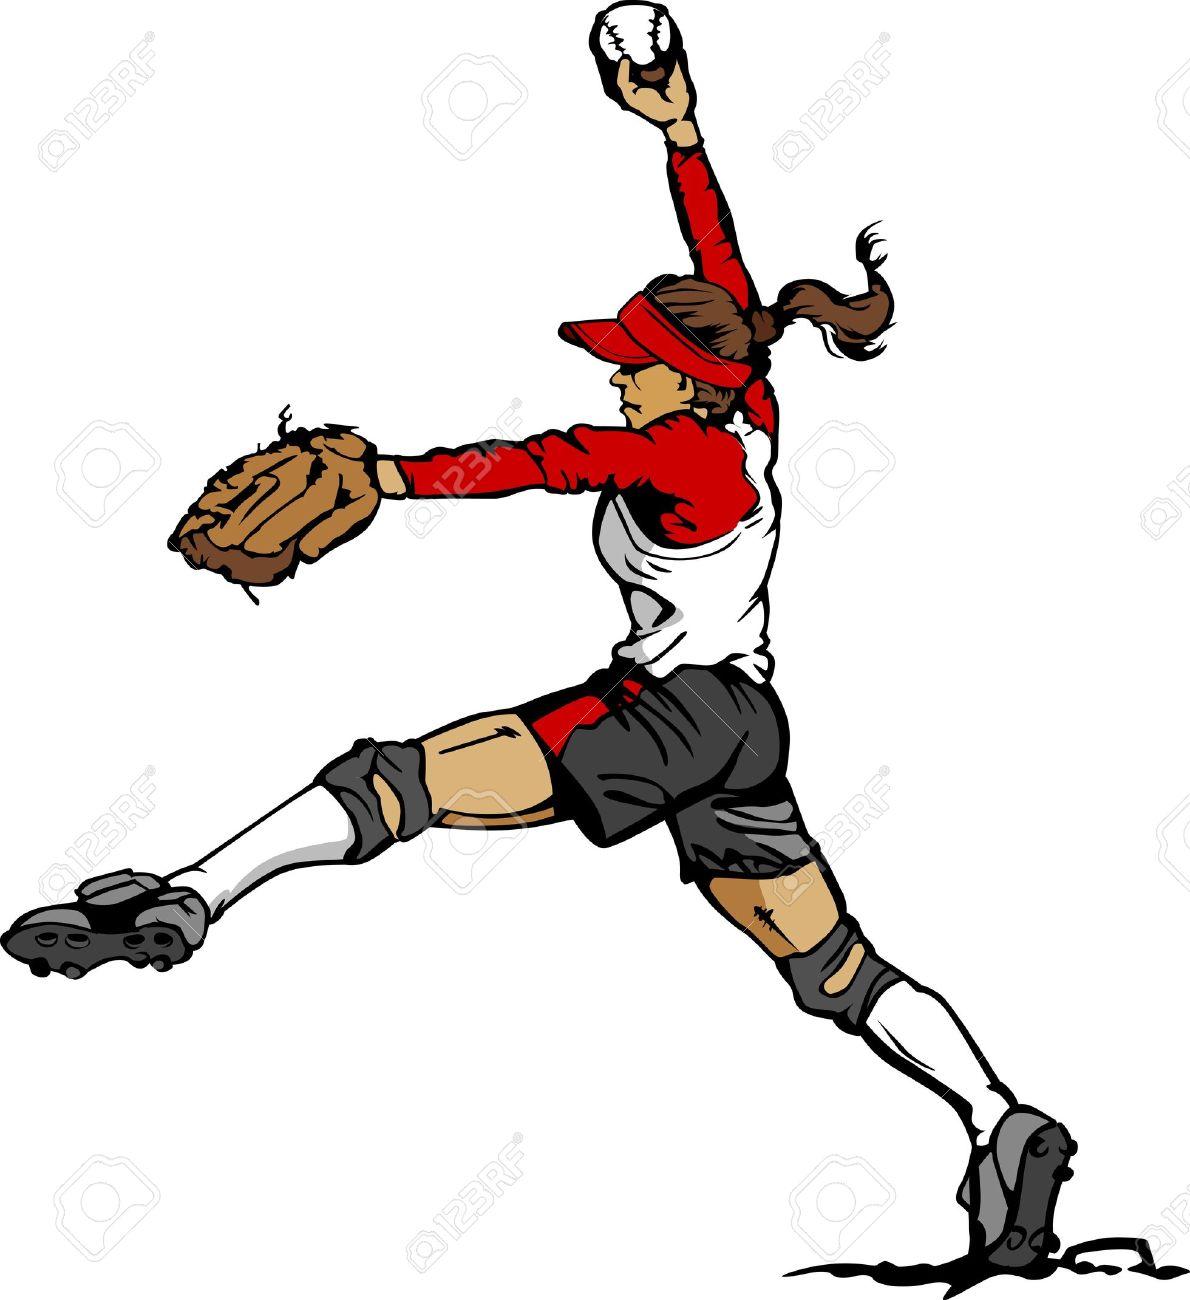 6,116 Softball Stock Vector Illustration And Royalty Free Softball ...